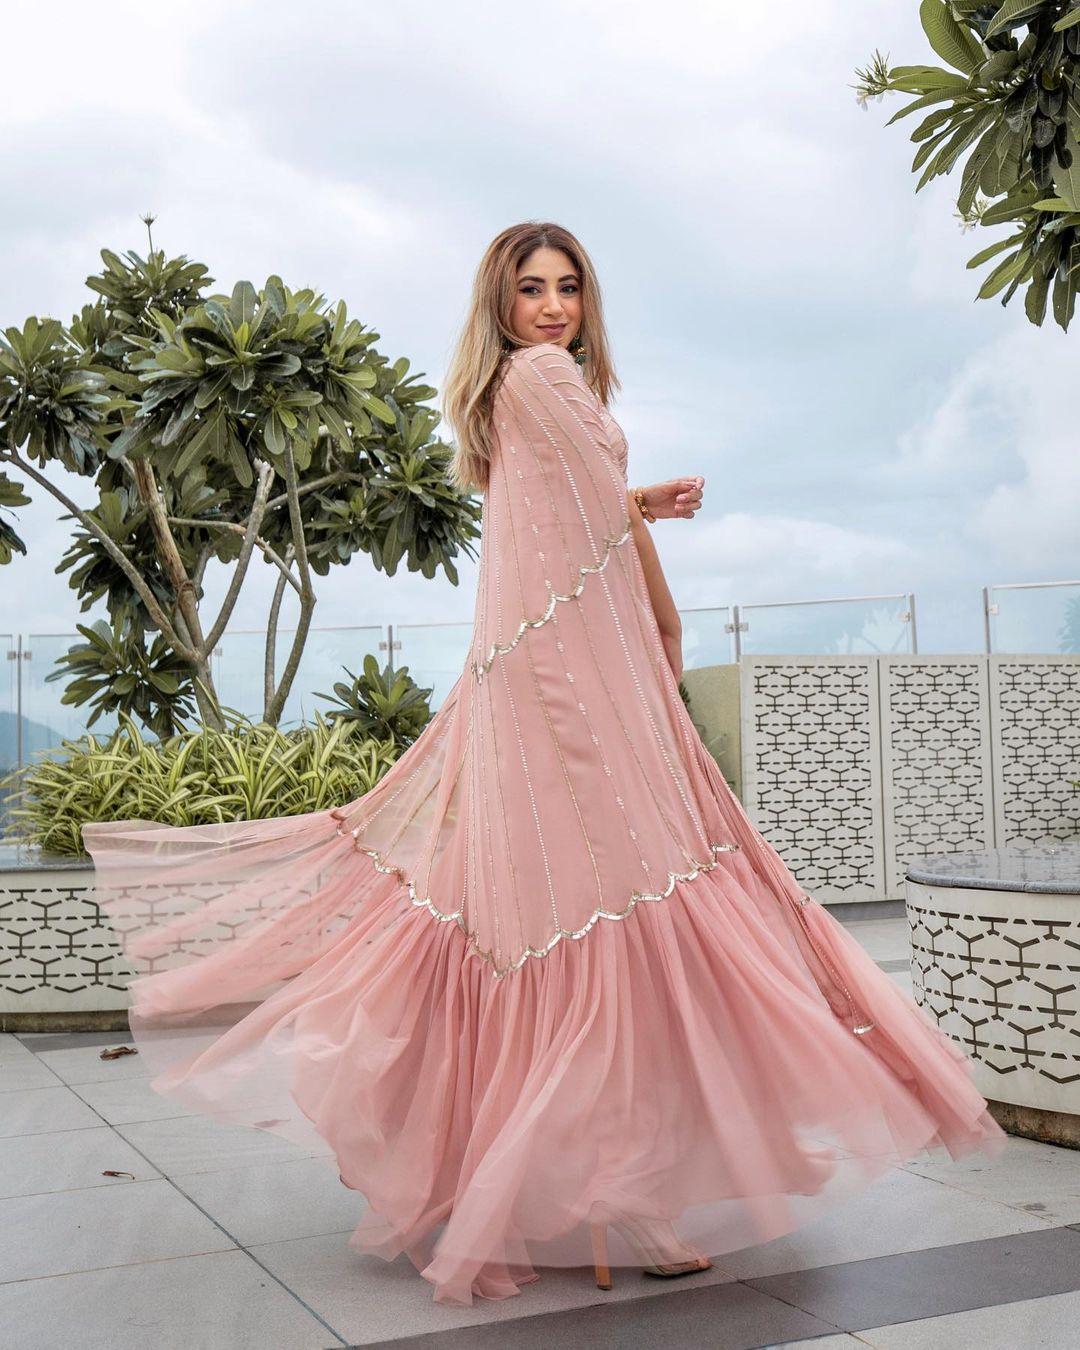 Aashna Shroff giving us major bridesmaid goals in in this peach colored lehenga.